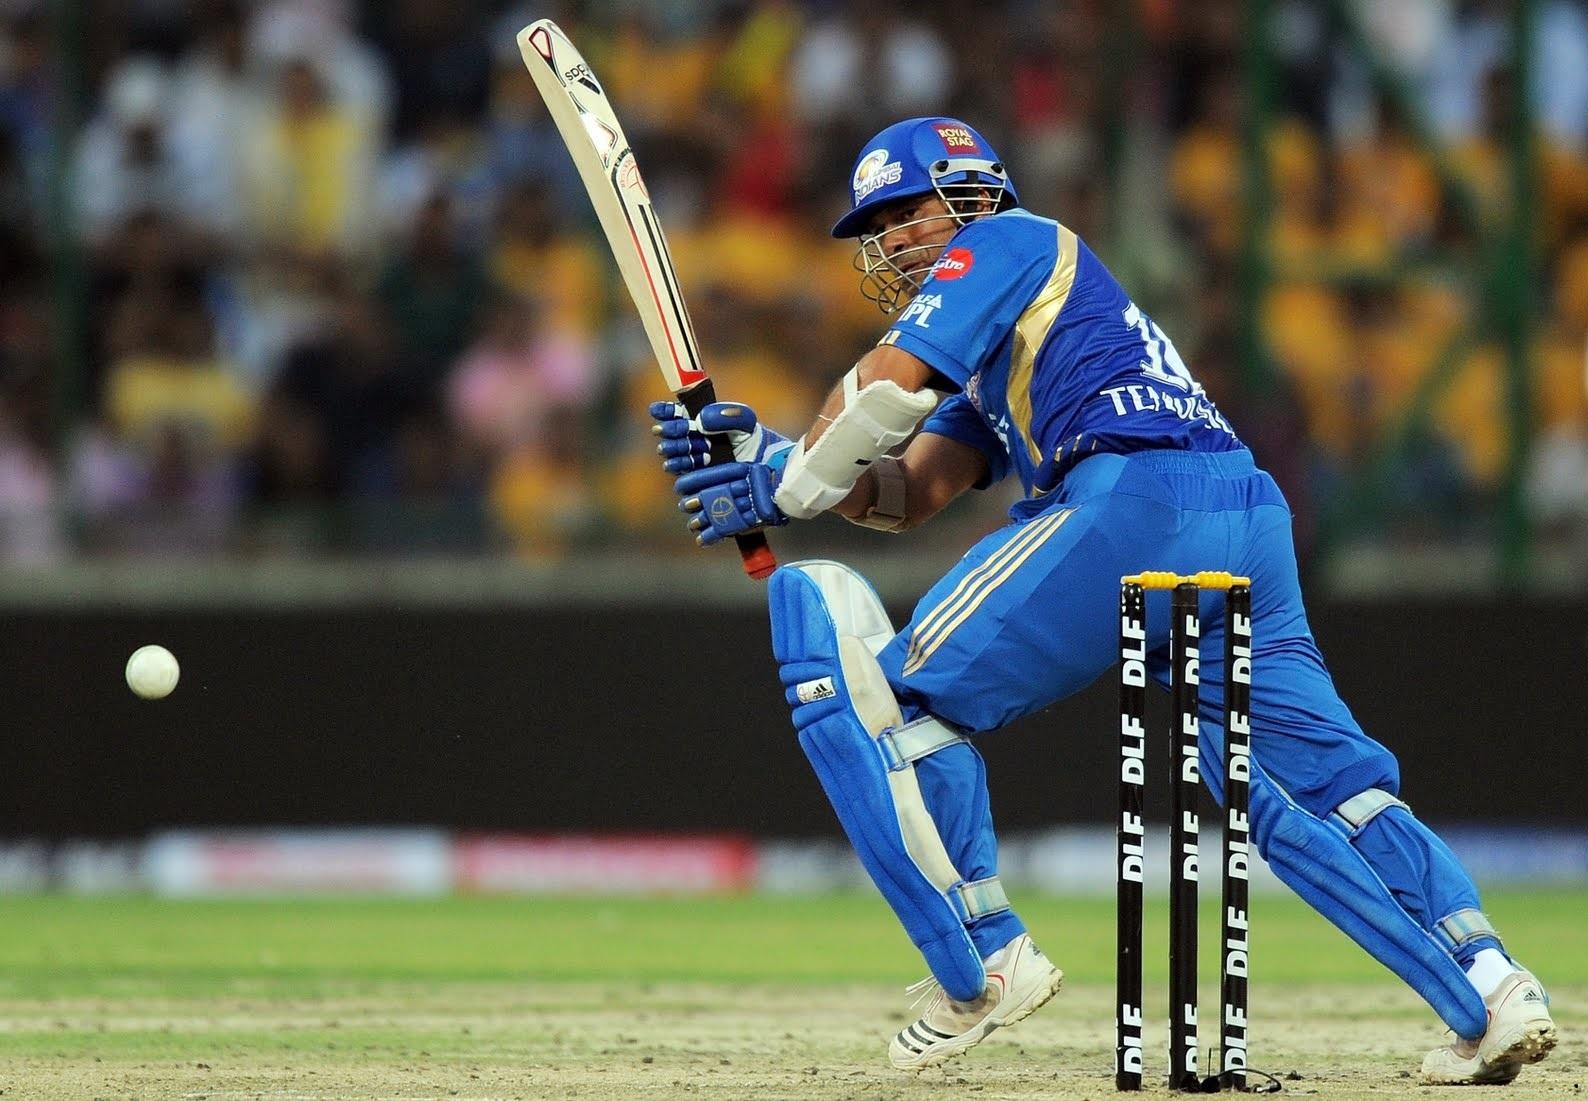 Cricket HD Wallpapers Widescreen - Cricket Live Scores, Cricket News Articles, T20, IPL, World Cup